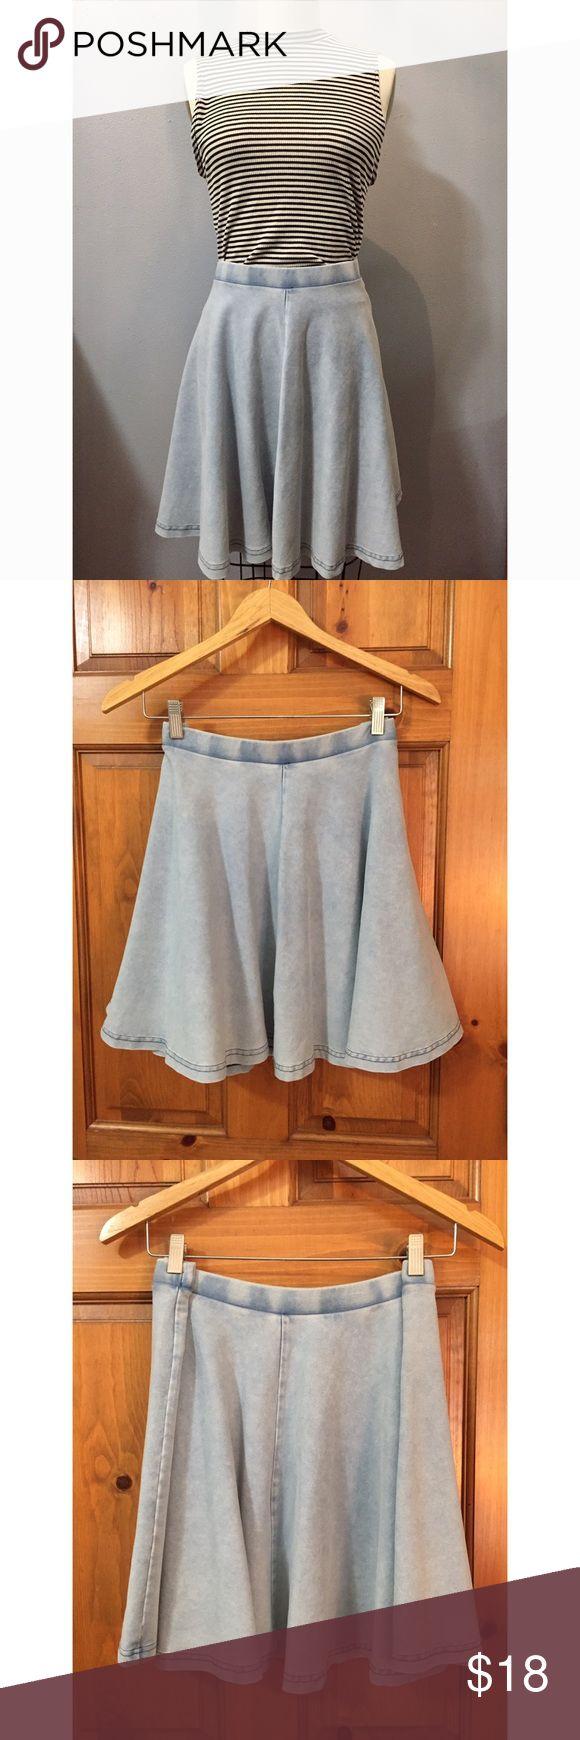 Topshop denim skater skirt Cute denim skirt from topshop barely worn, amazing condition Topshop Skirts Circle & Skater